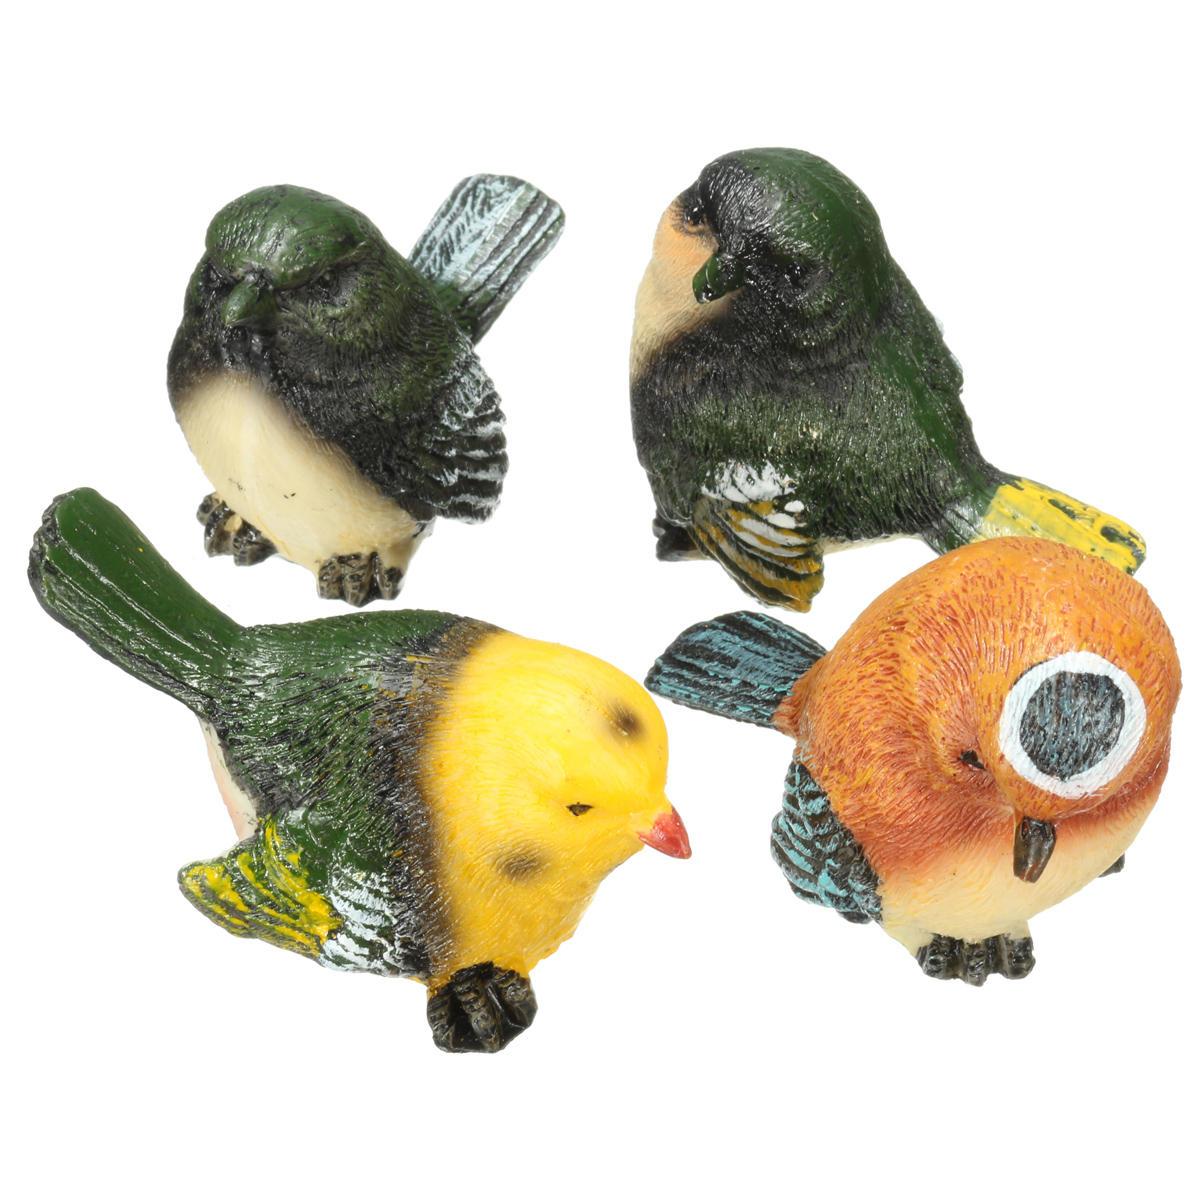 4 Unids / set Resina Aves Estatua Estatuilla Home Garden DIY Bonsai Escritorio Decoración Ornamento Decoraciones